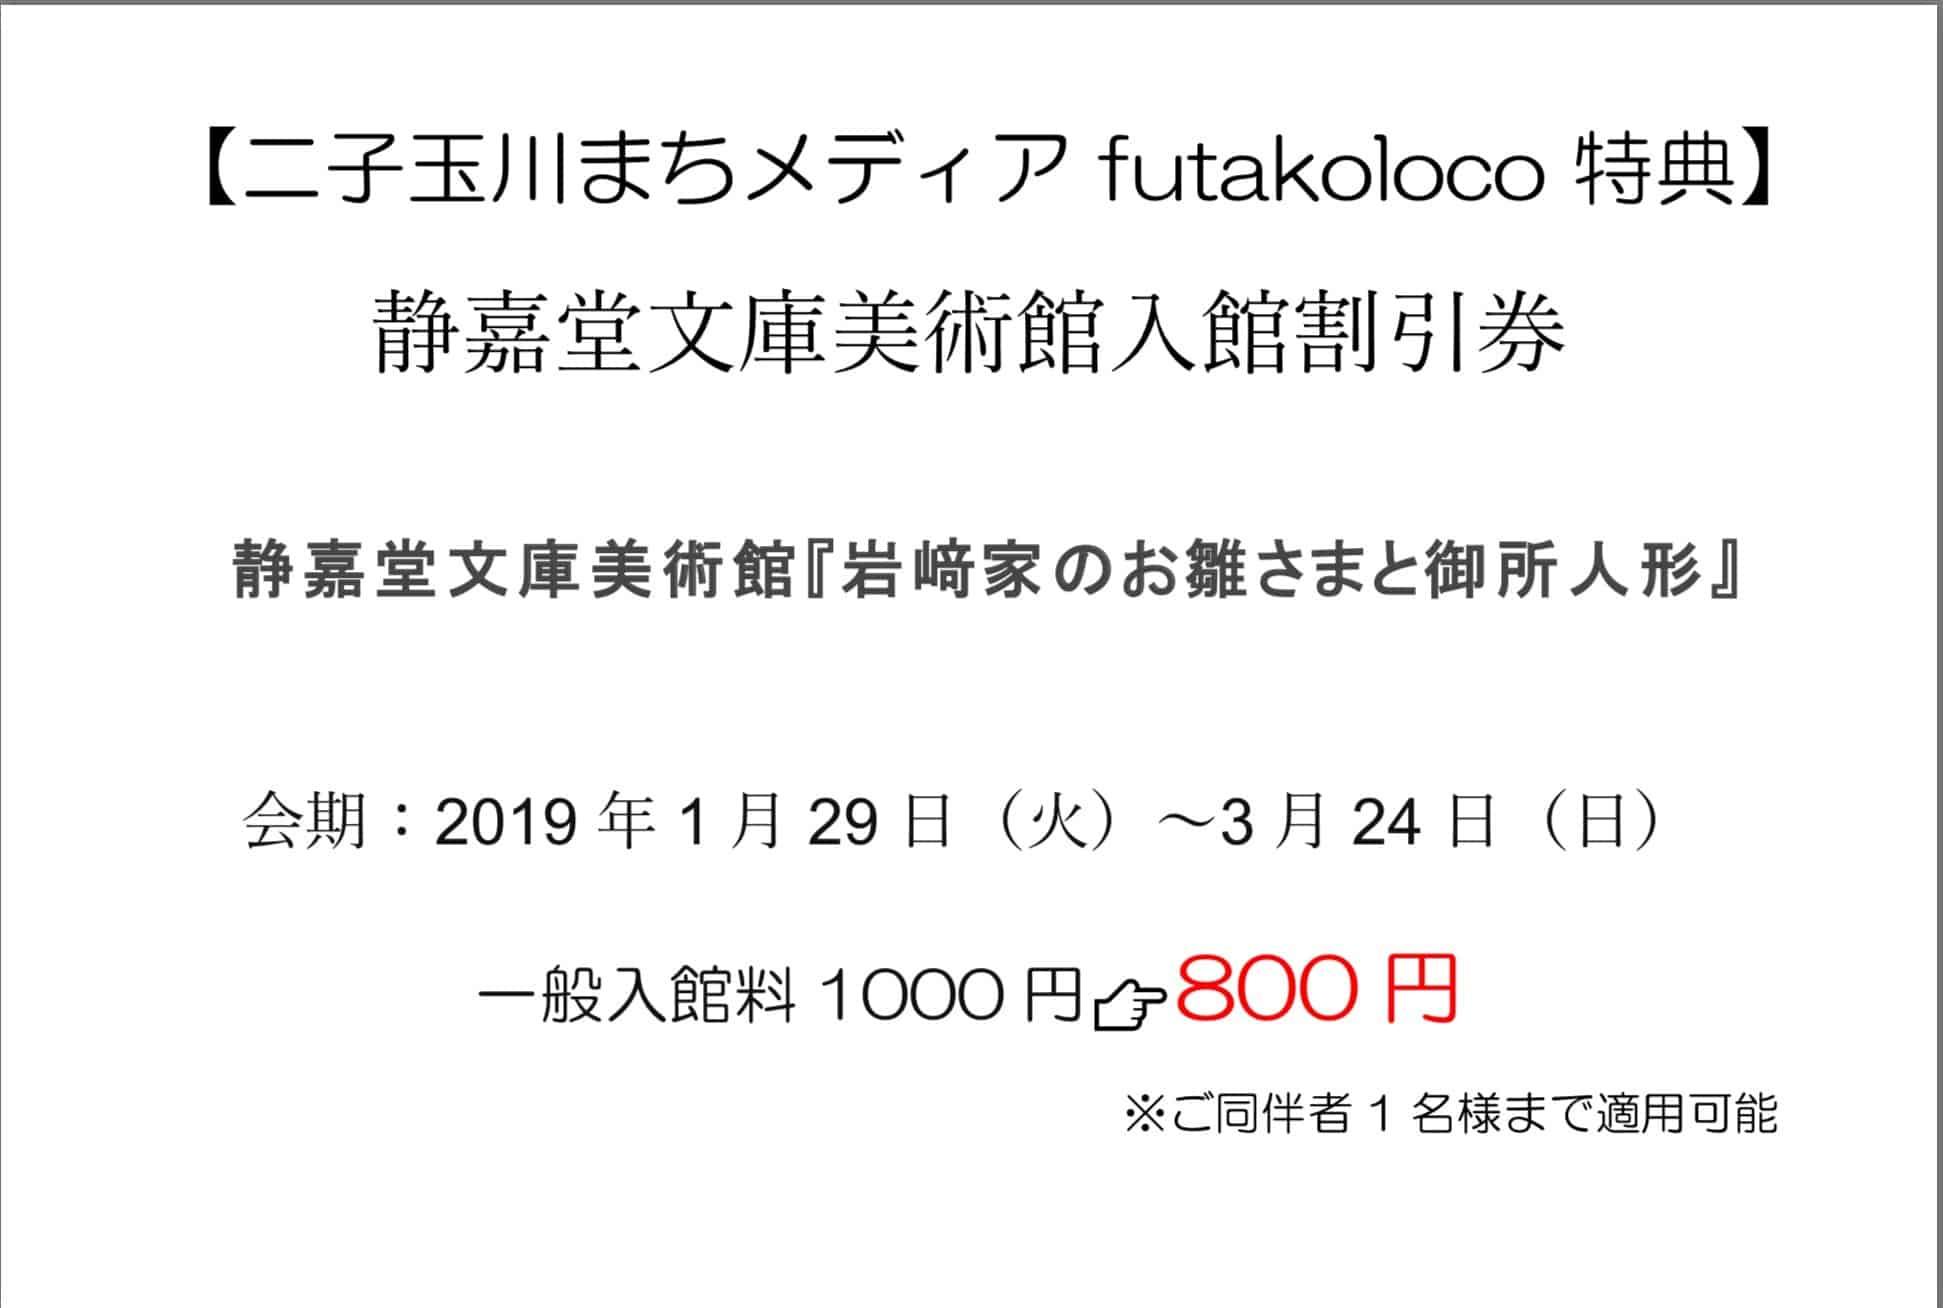 futakoloco 特別入館割引券(入館時に画像提示ください)